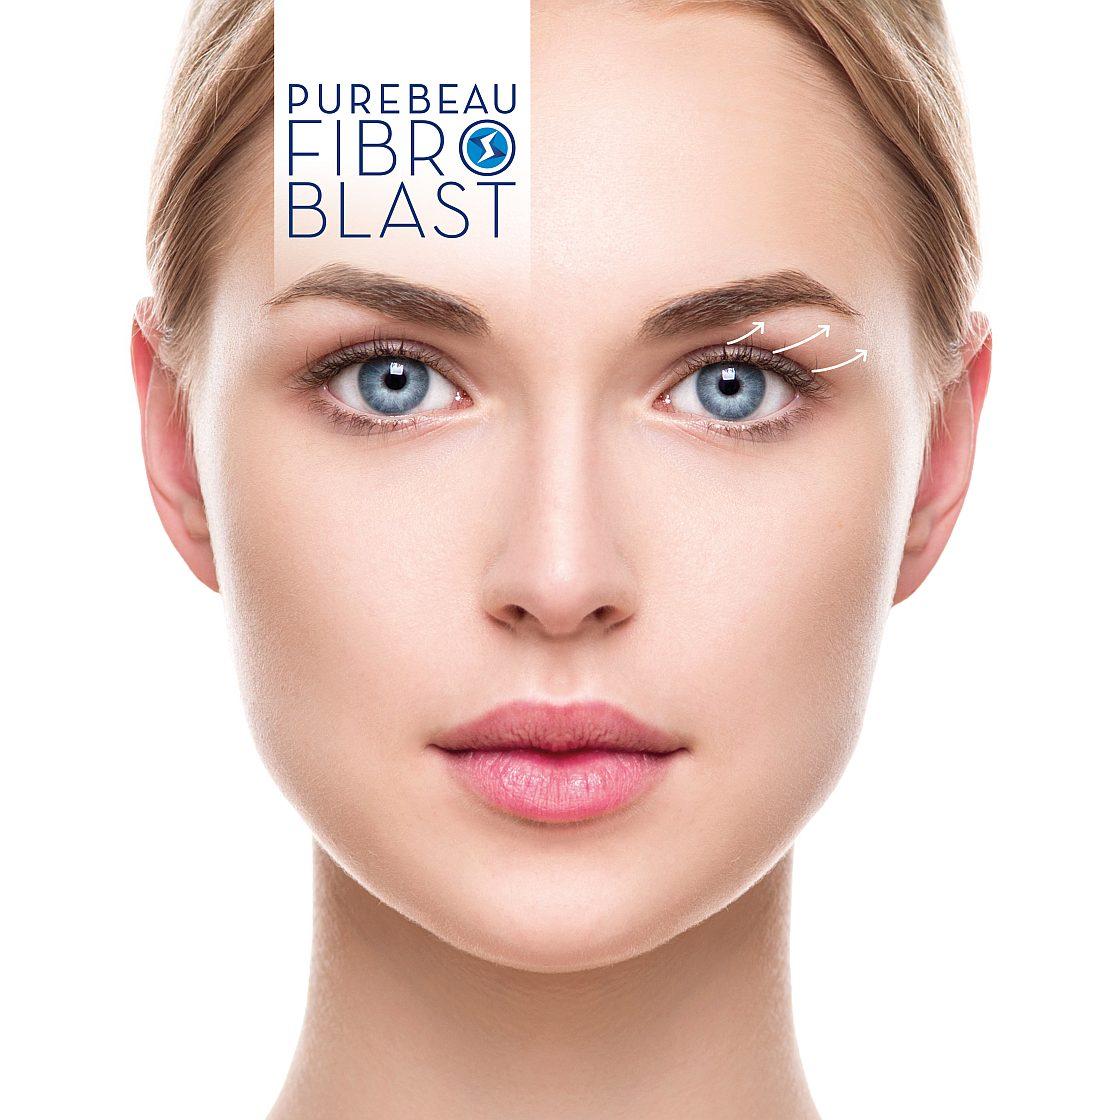 PB FIBROBLAST-Model_1-1120x1120